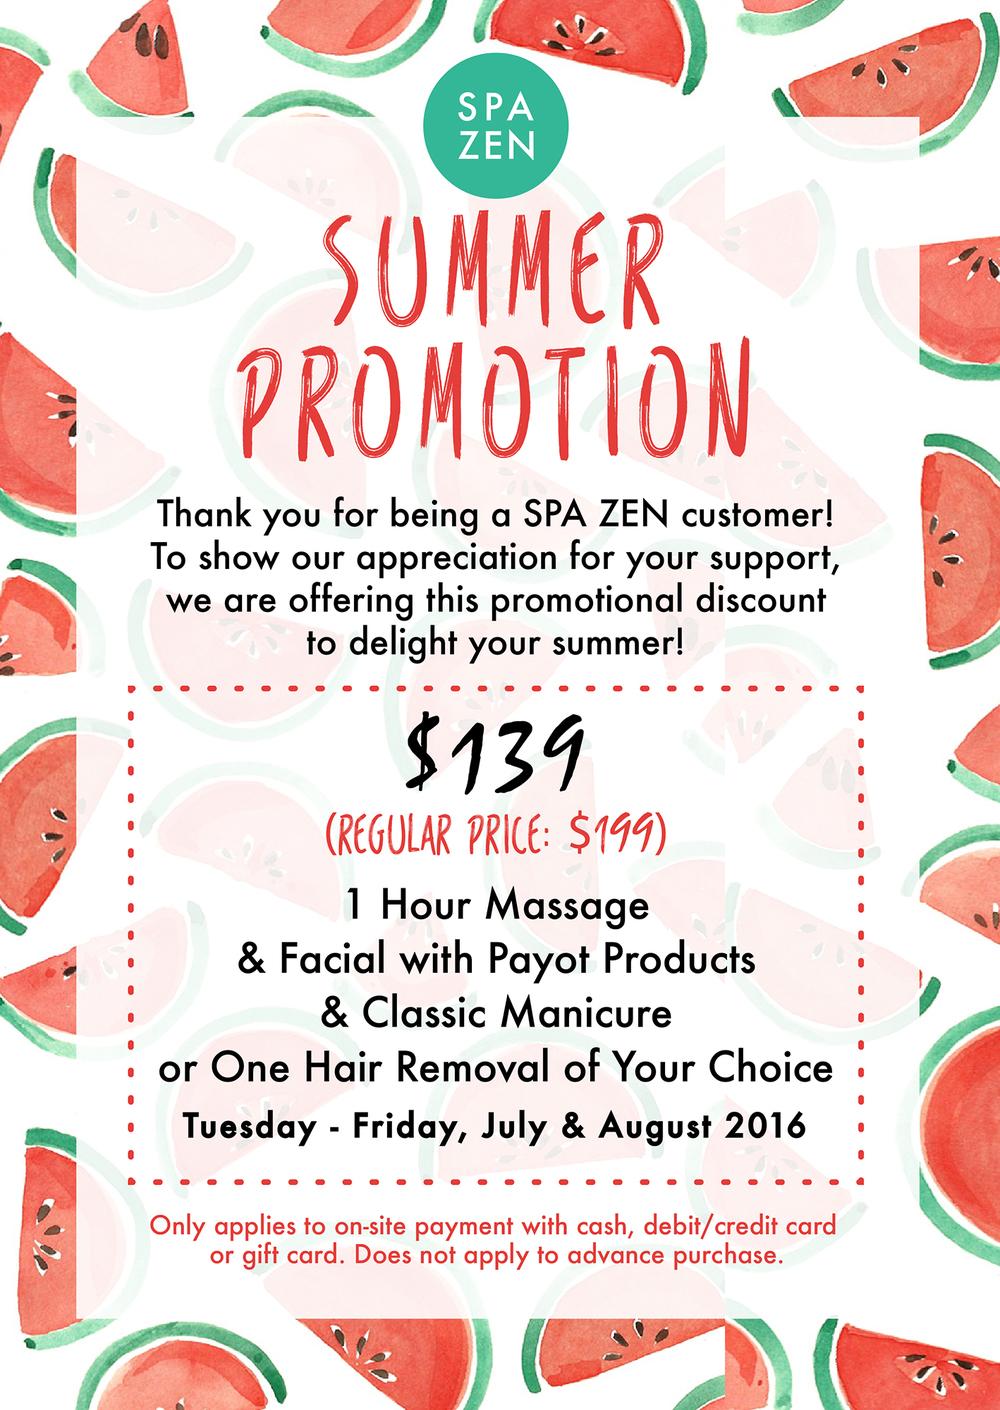 Summer-Promotion-En-Web.jpg